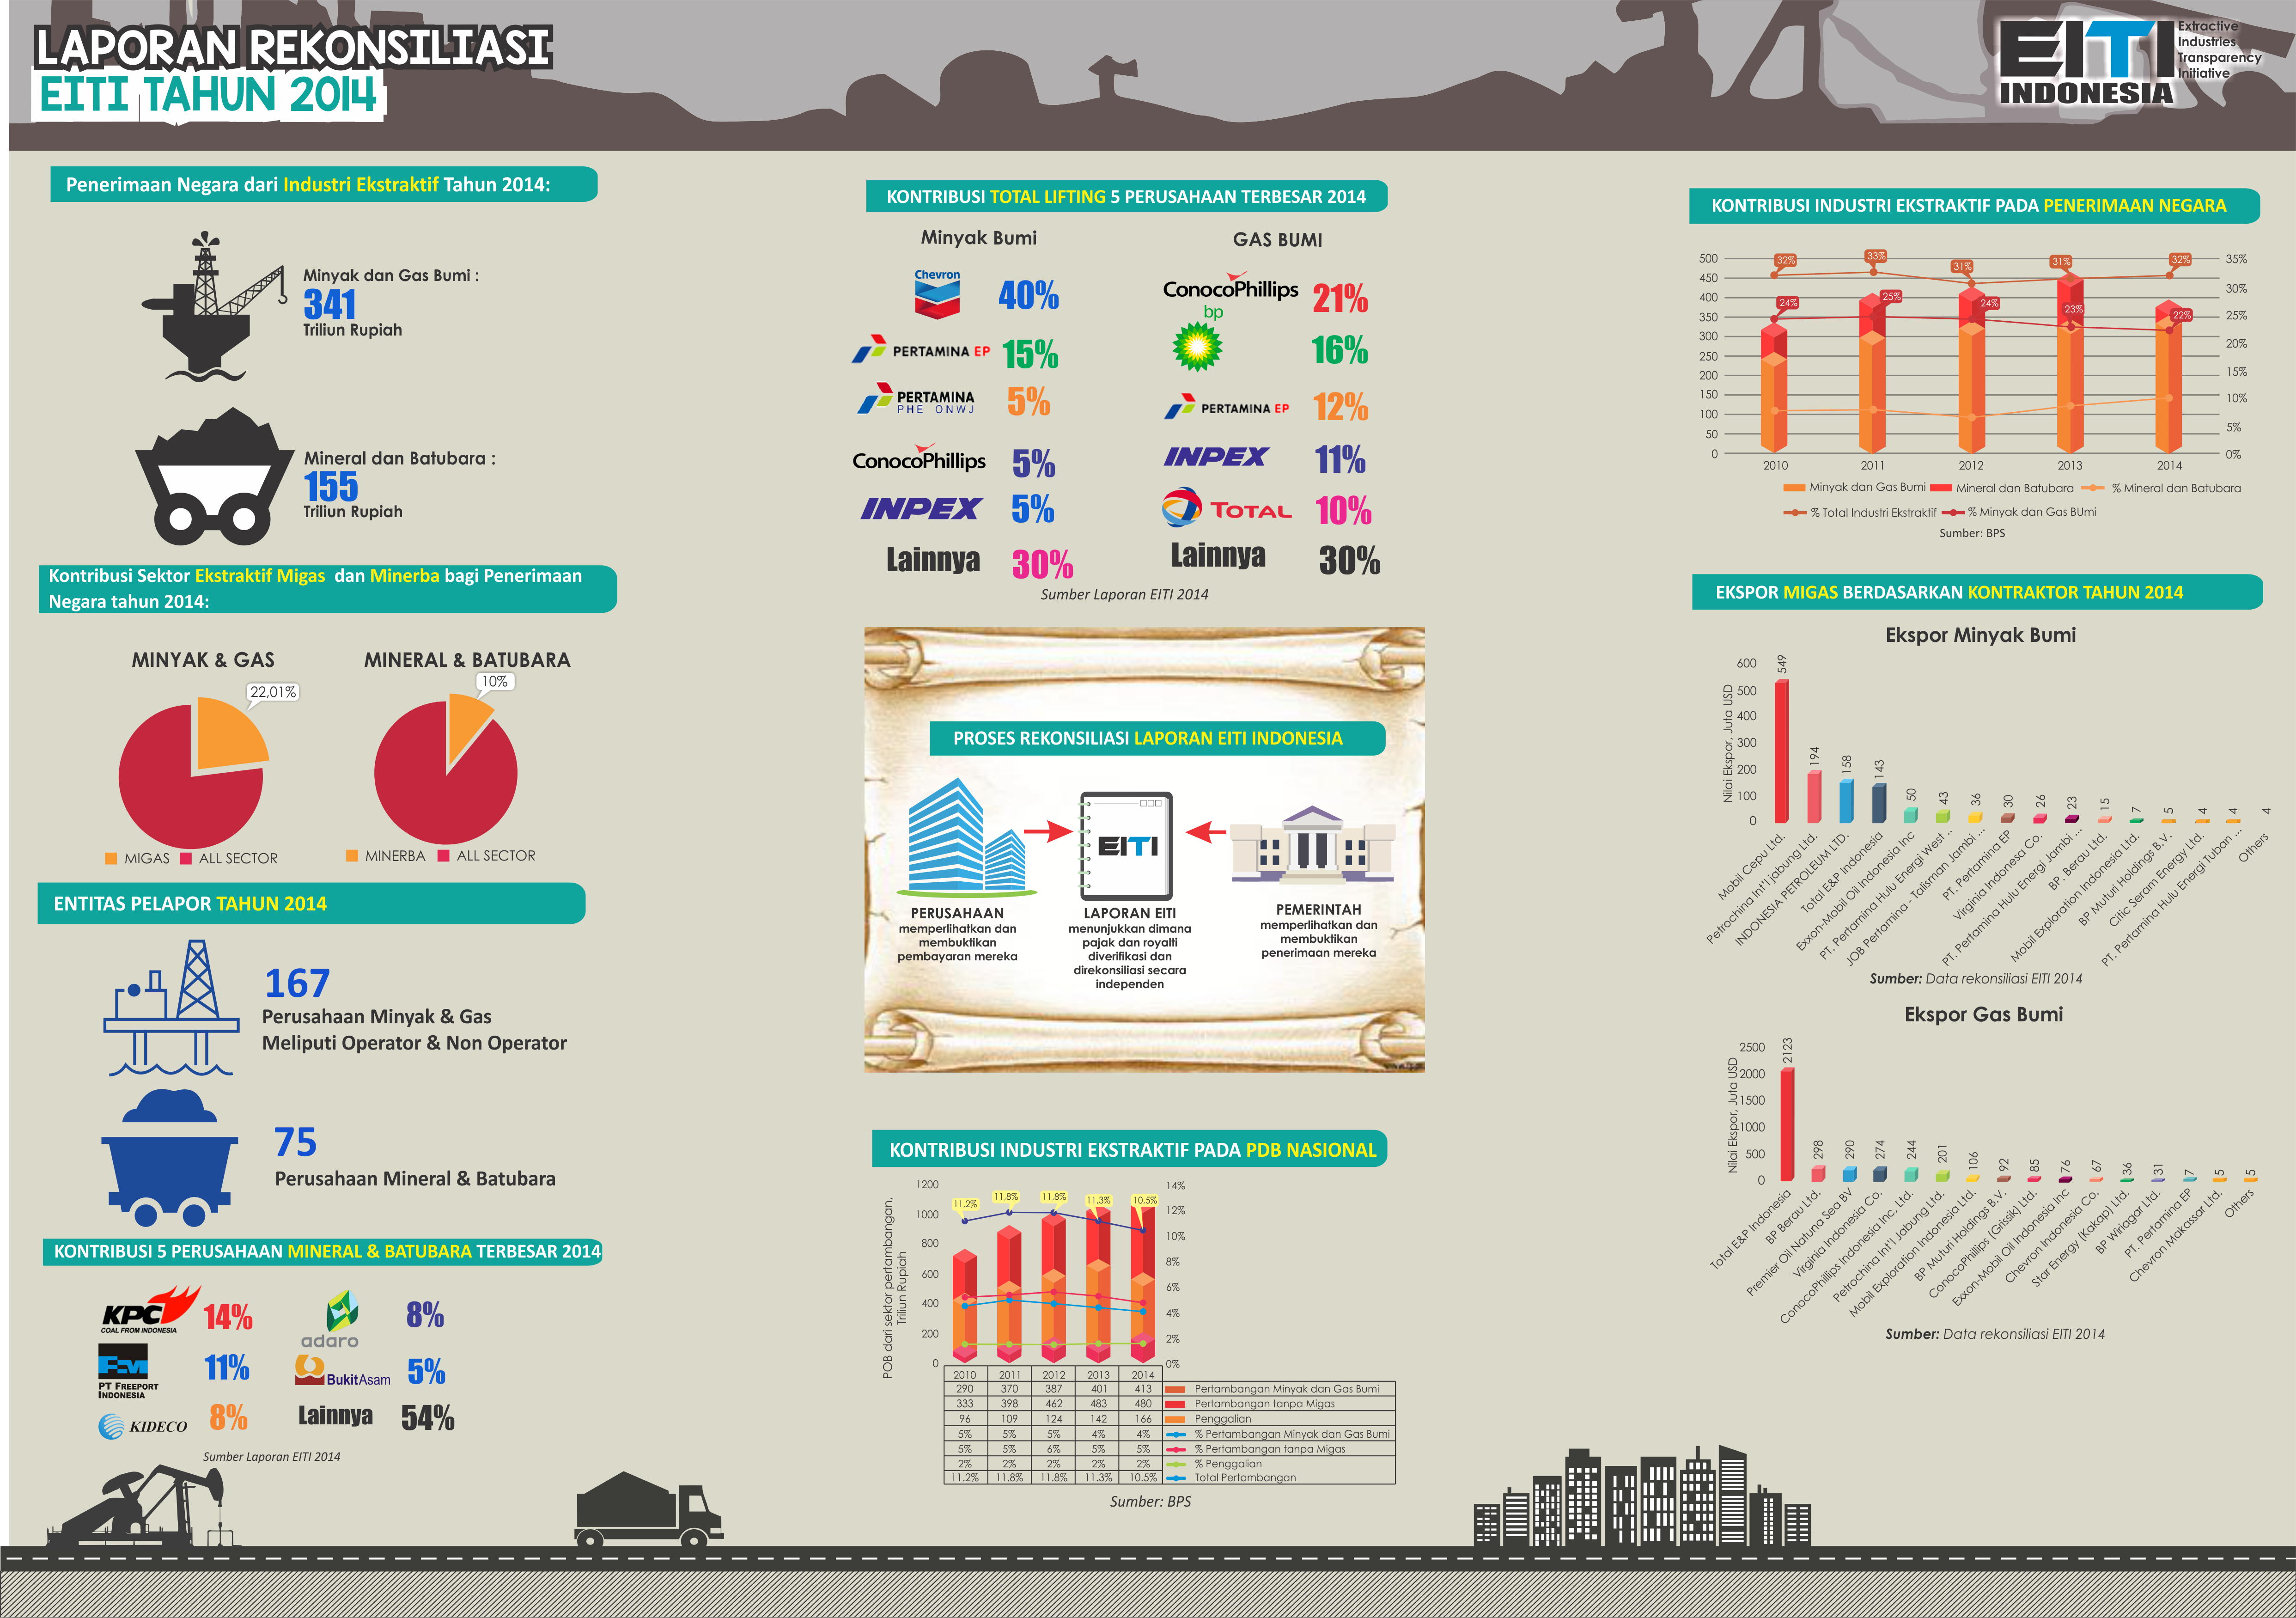 Infografis Lap EITI 2014_26May2017